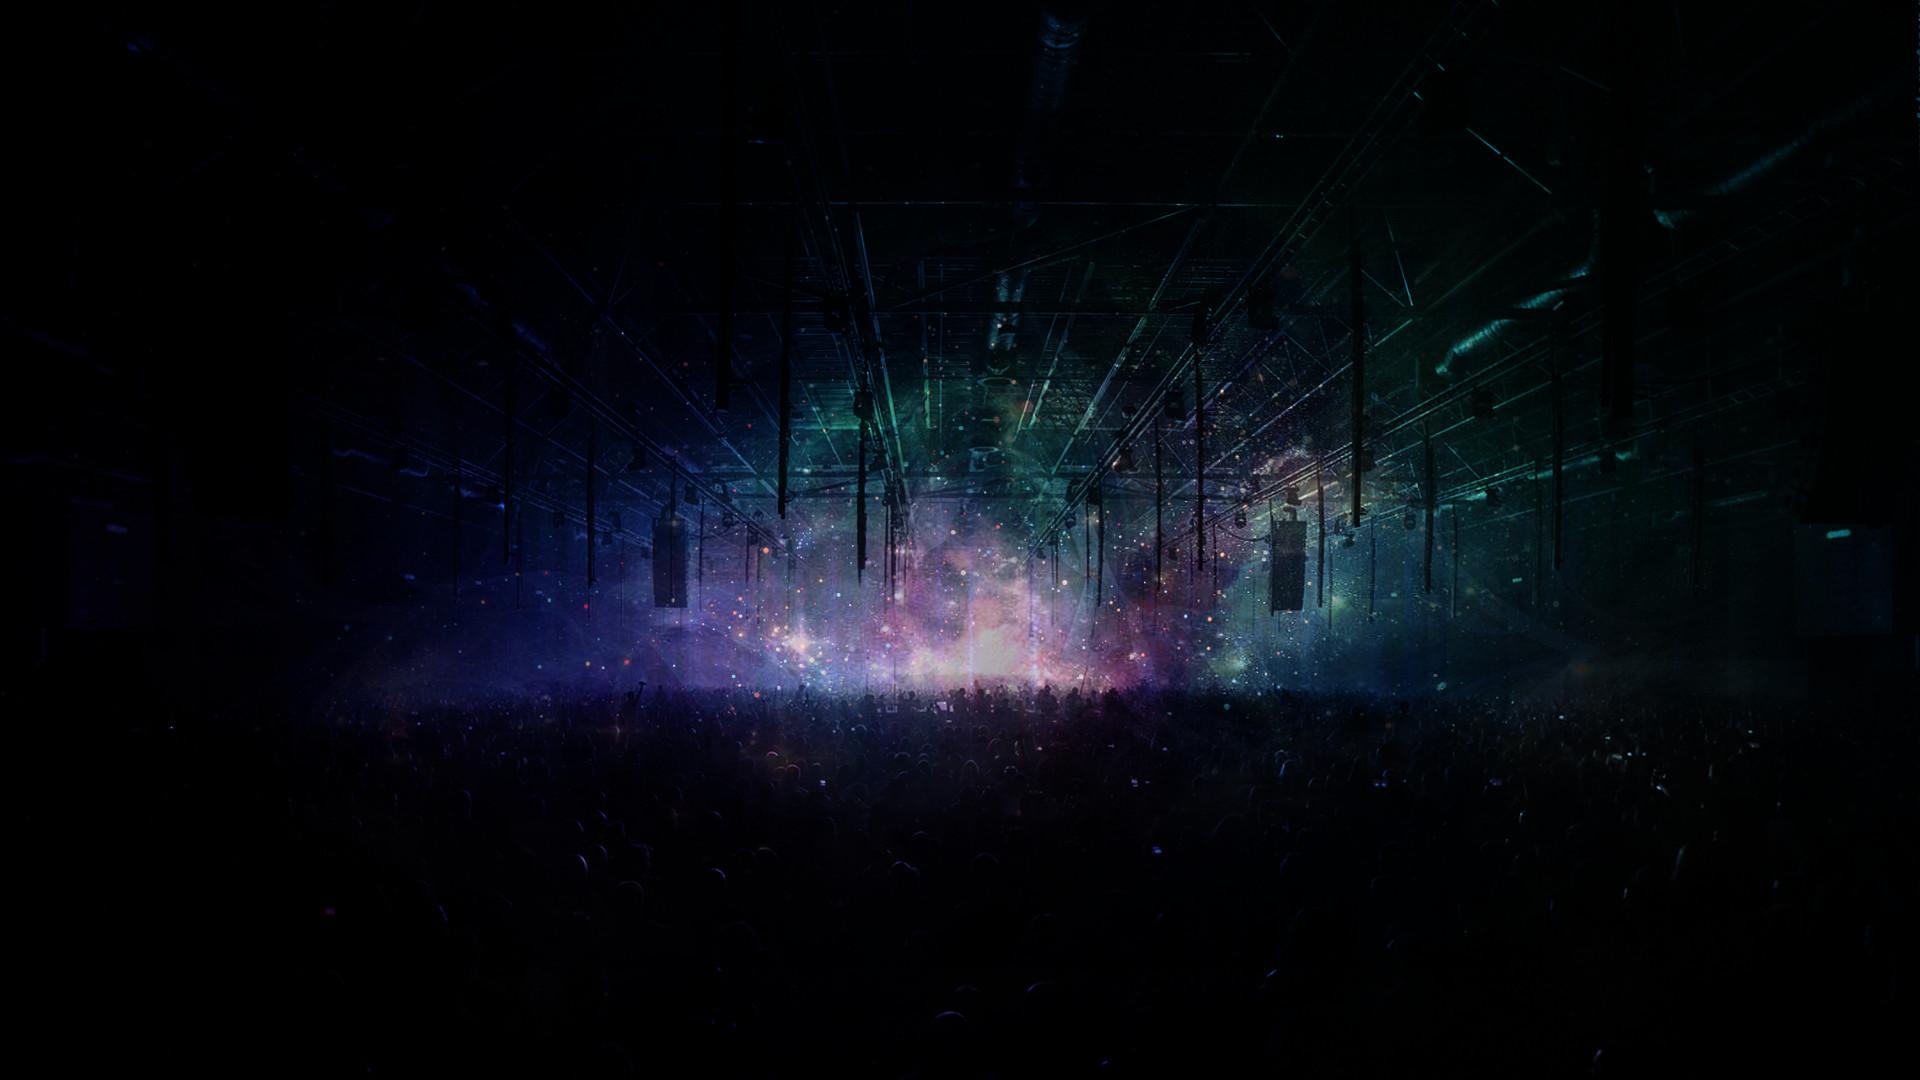 Rave Concert concerts wallpaper 1920x1080 117654 WallpaperUP 1920x1080